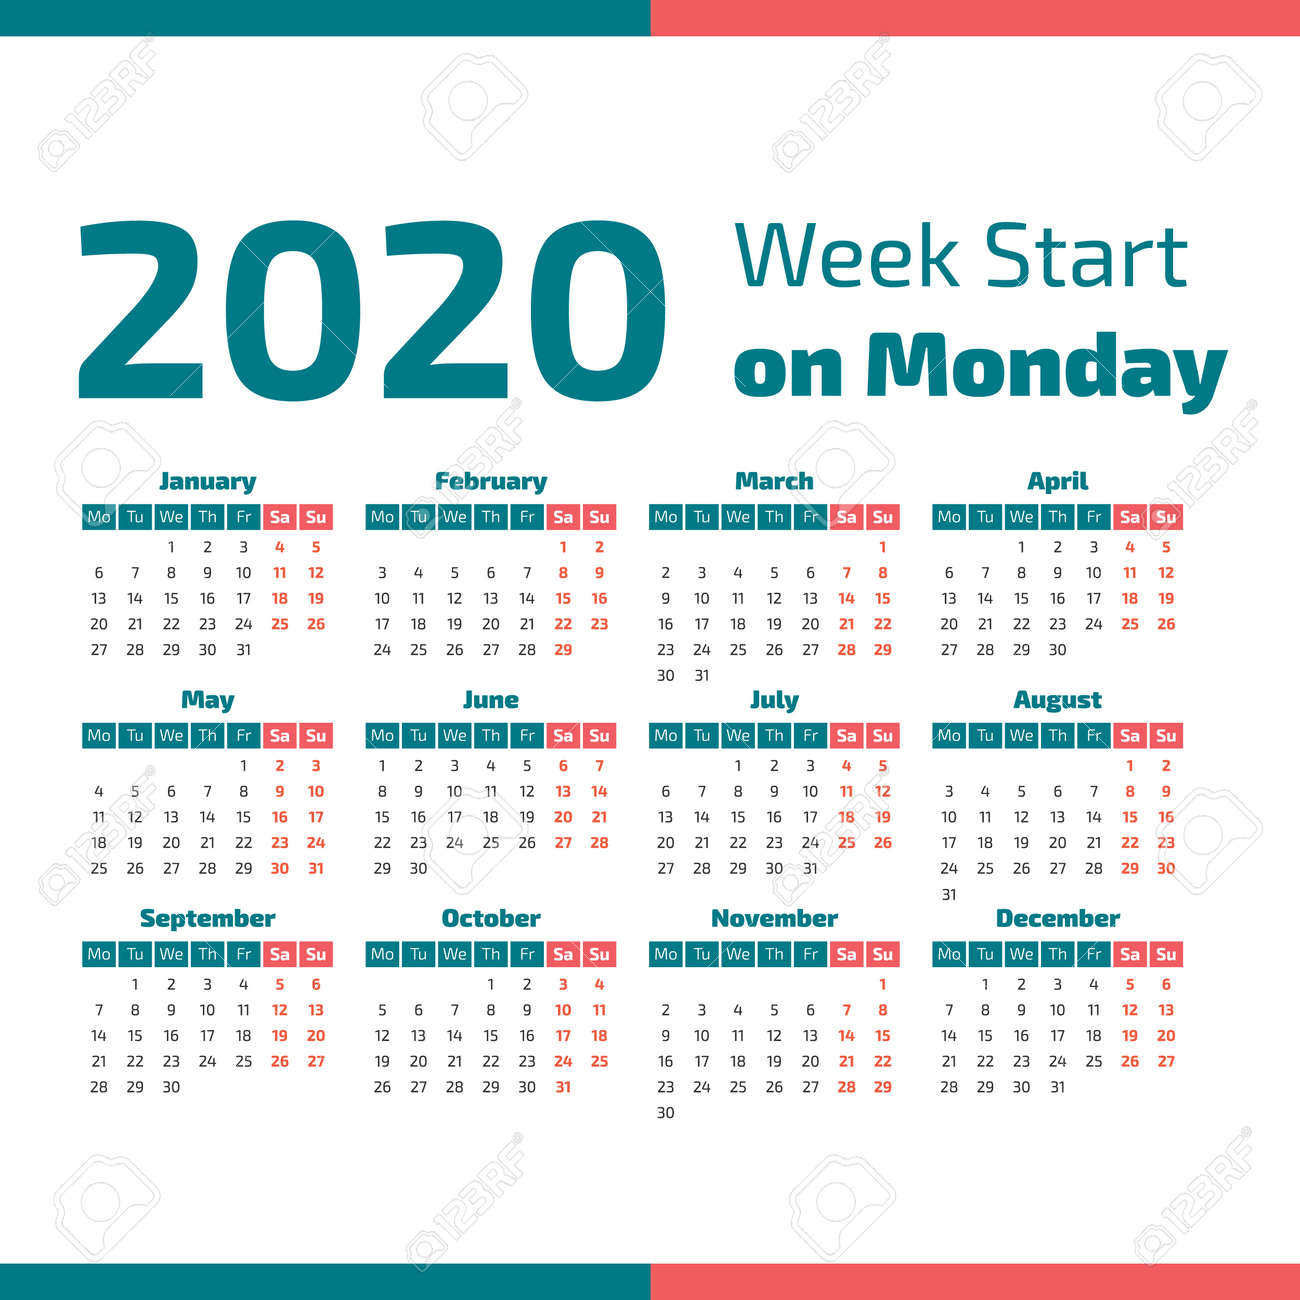 5 Year Calendar Starting 2020 Simple 2020 Year Calendar, Week Starts On Monday Vector